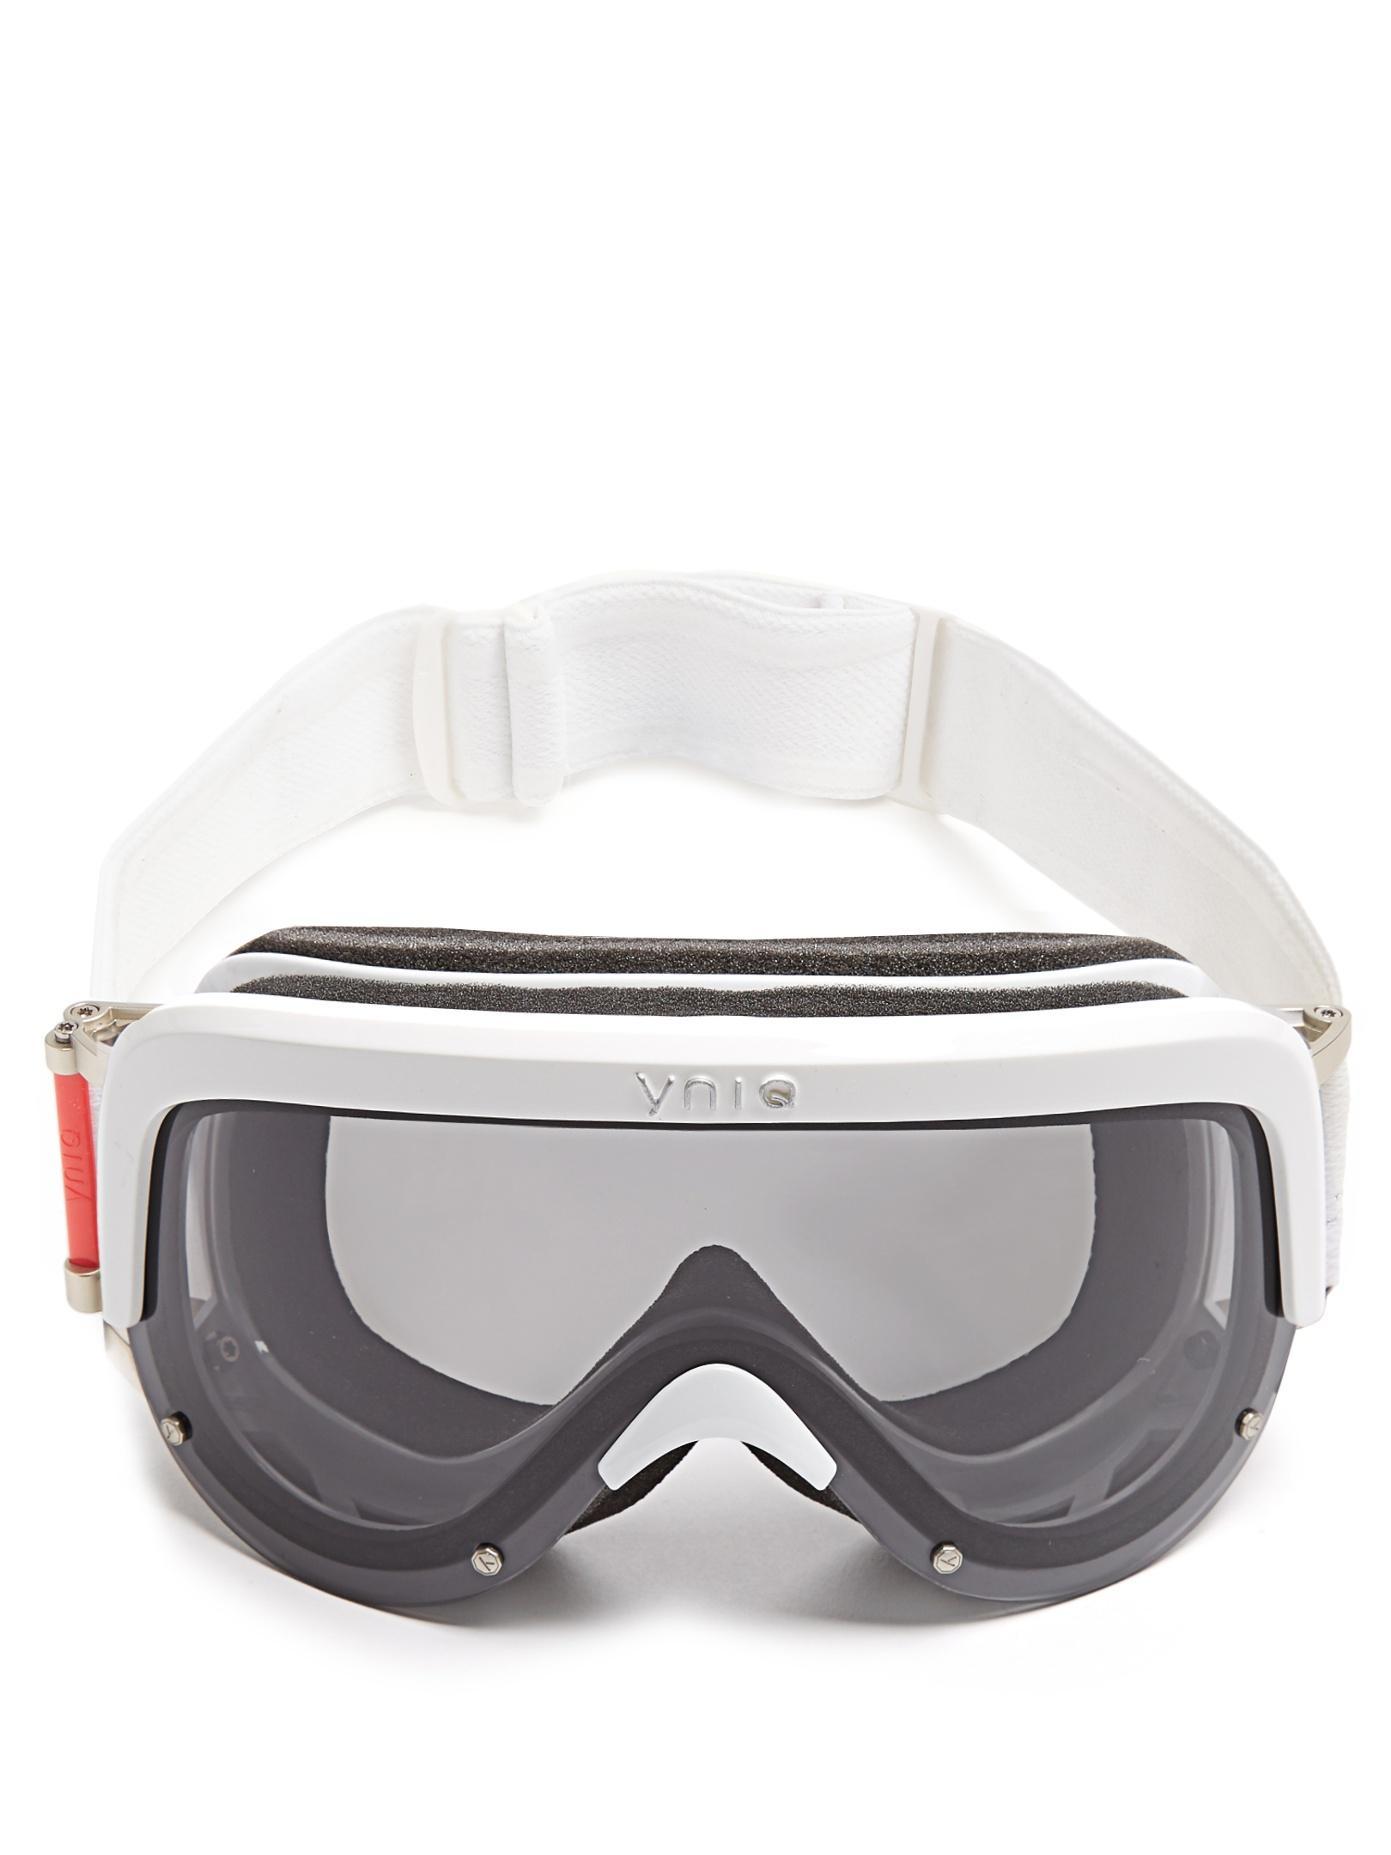 Yniq Model One Extended-Vision Ski Goggles In White Multi